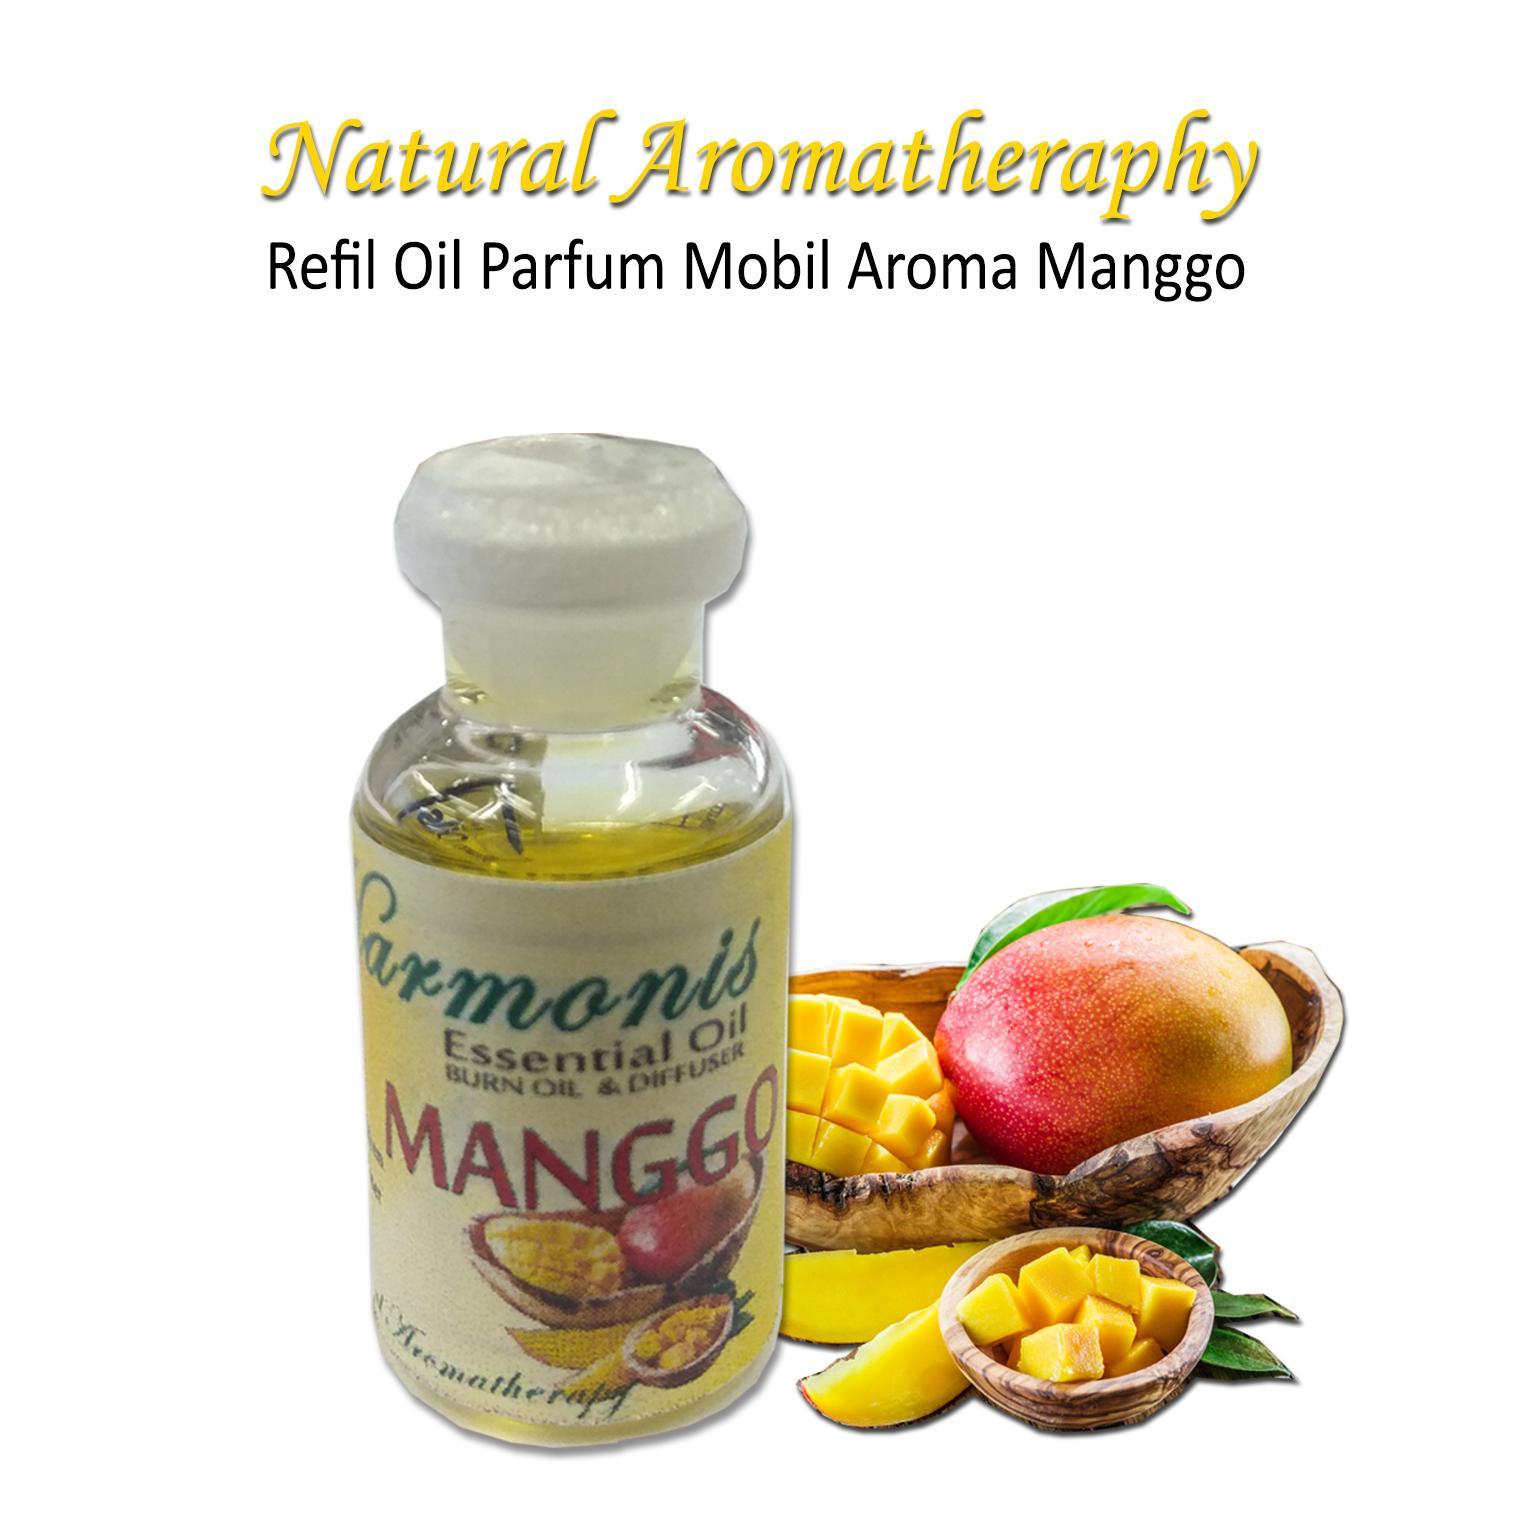 Cek Harga Baru Refil Oil Parfum Mobil Aromaterapi Aroma Coffee Unt Car Vehicle Aromatherapy Humidifier Manggo Diffuser Usb